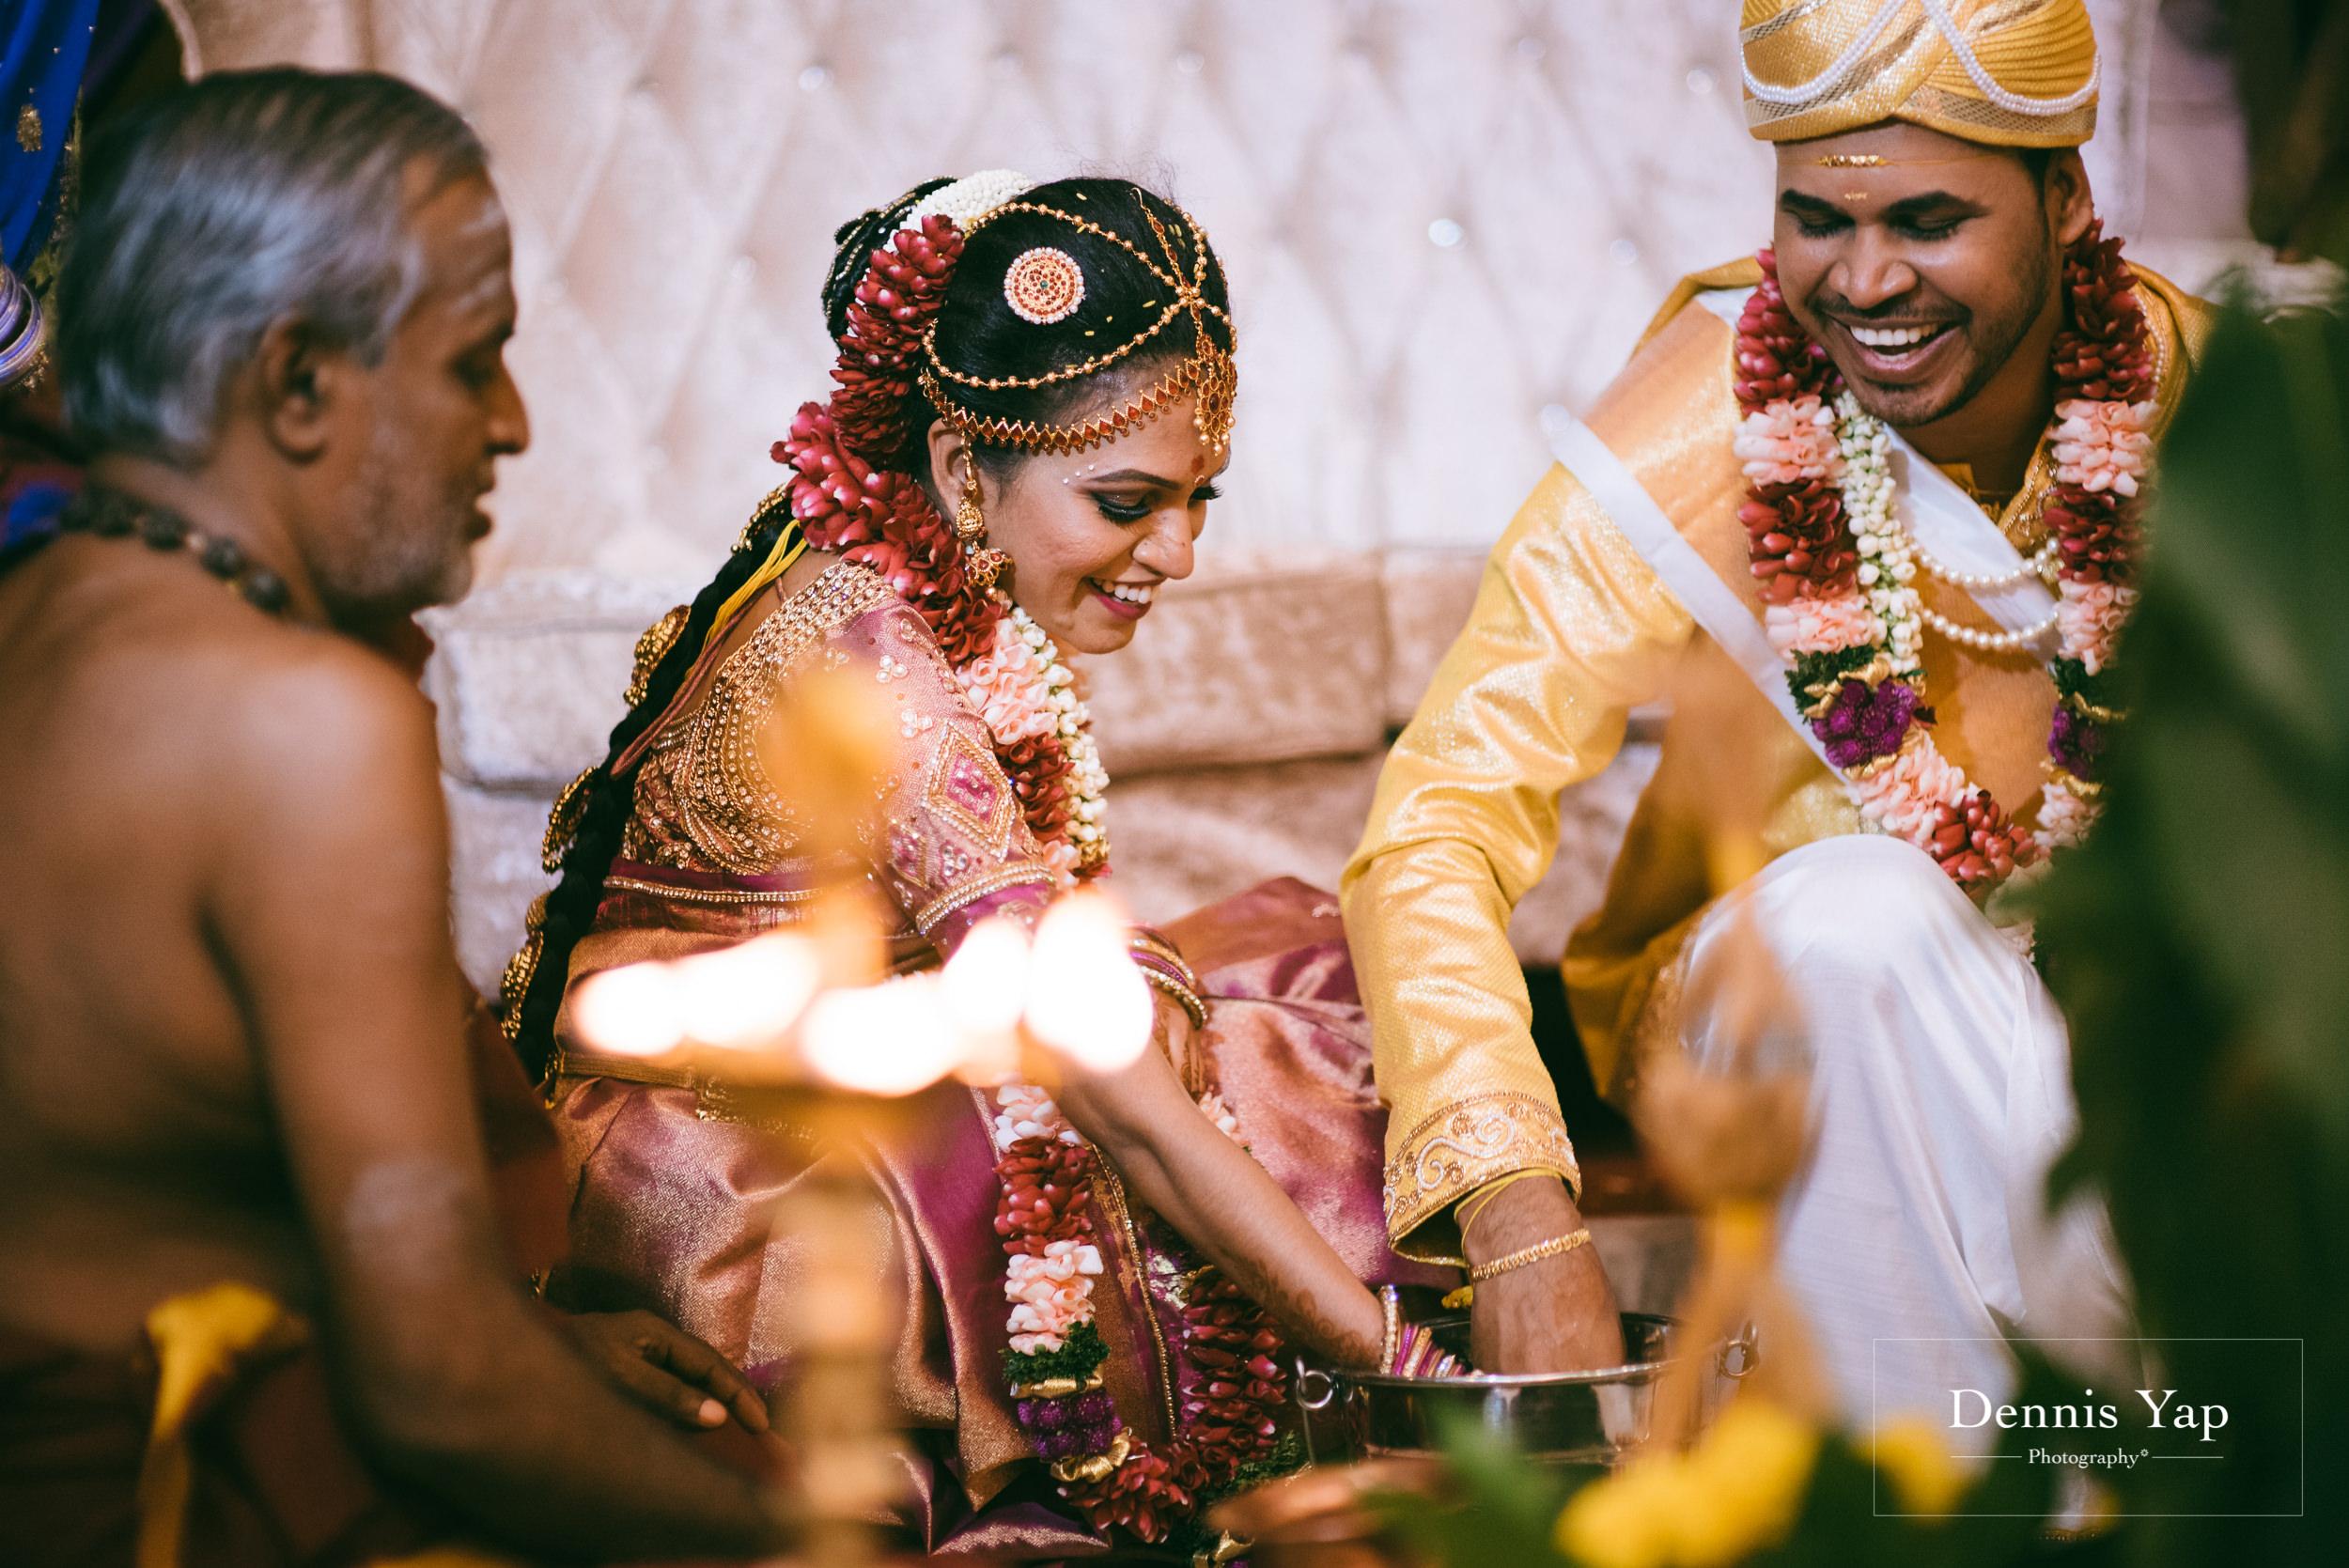 puvaneswaran cangitaa indian wedding ceremony ideal convention dennis yap photography malaysia-31.jpg